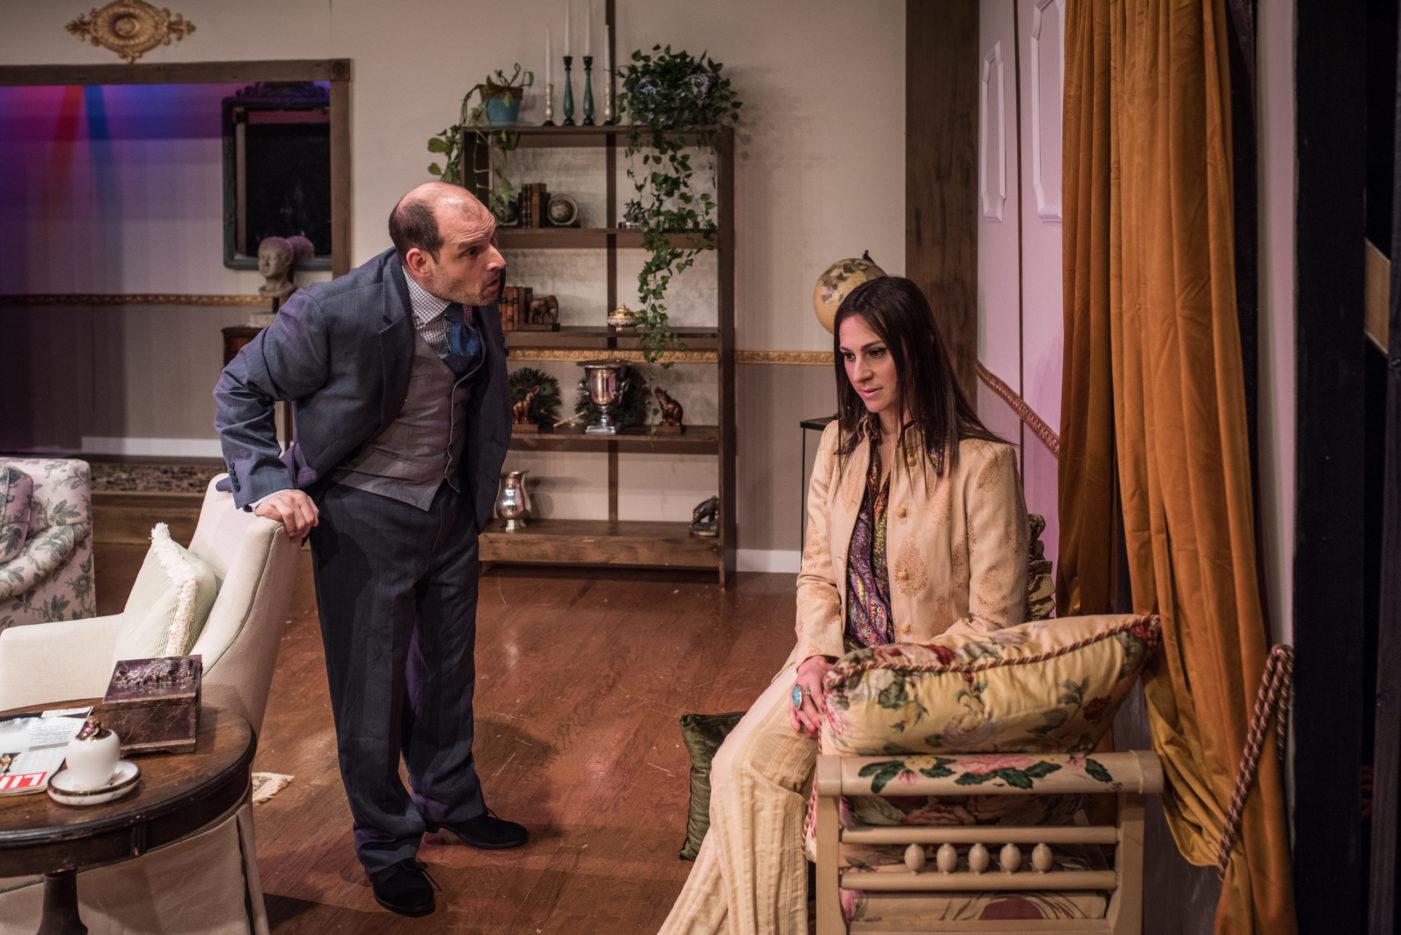 John Leonard and Tamara Salkin as Tobias and Julia in Edward Albee's